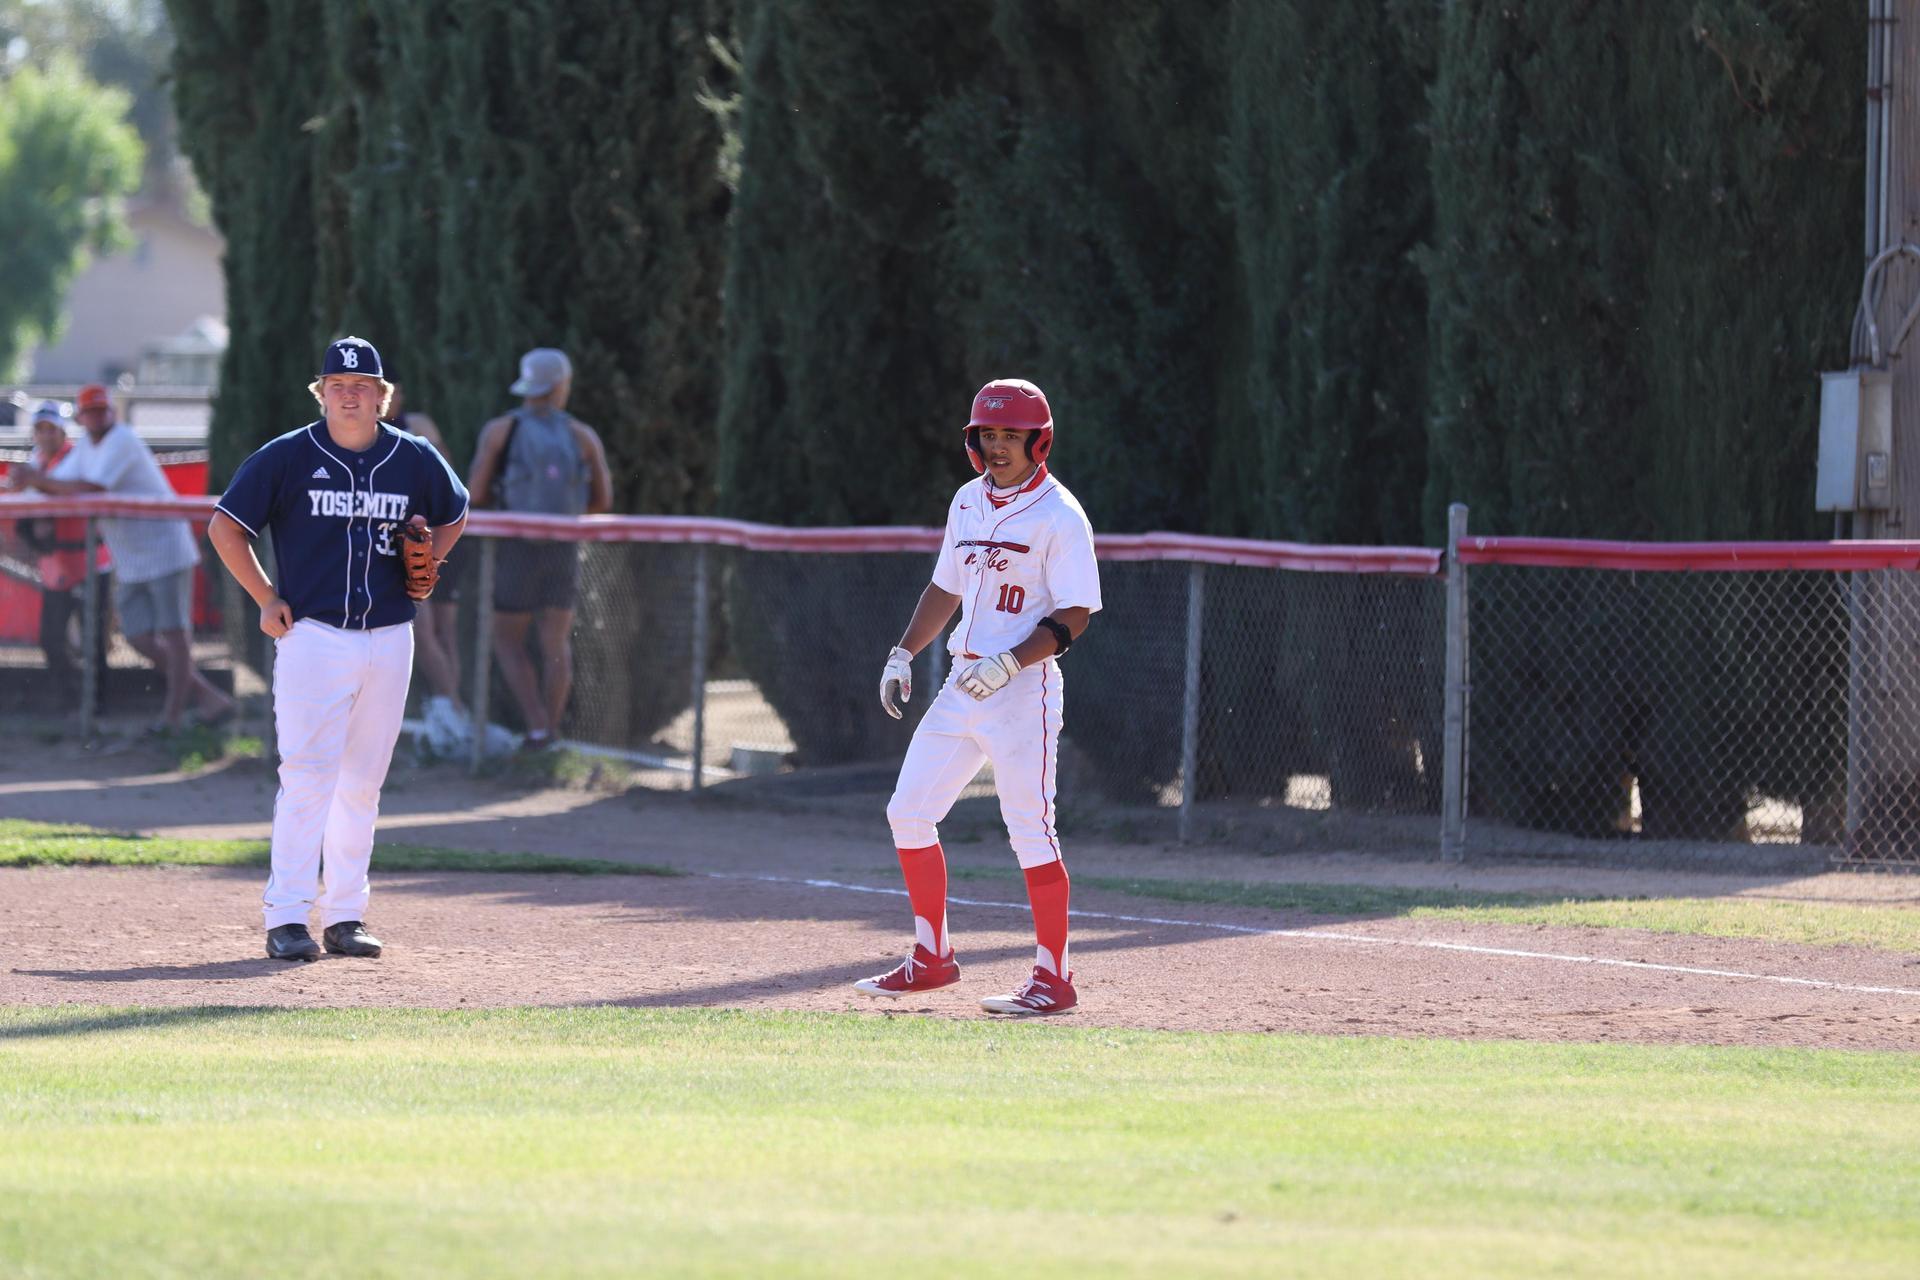 boys playing baseball against Yosemite